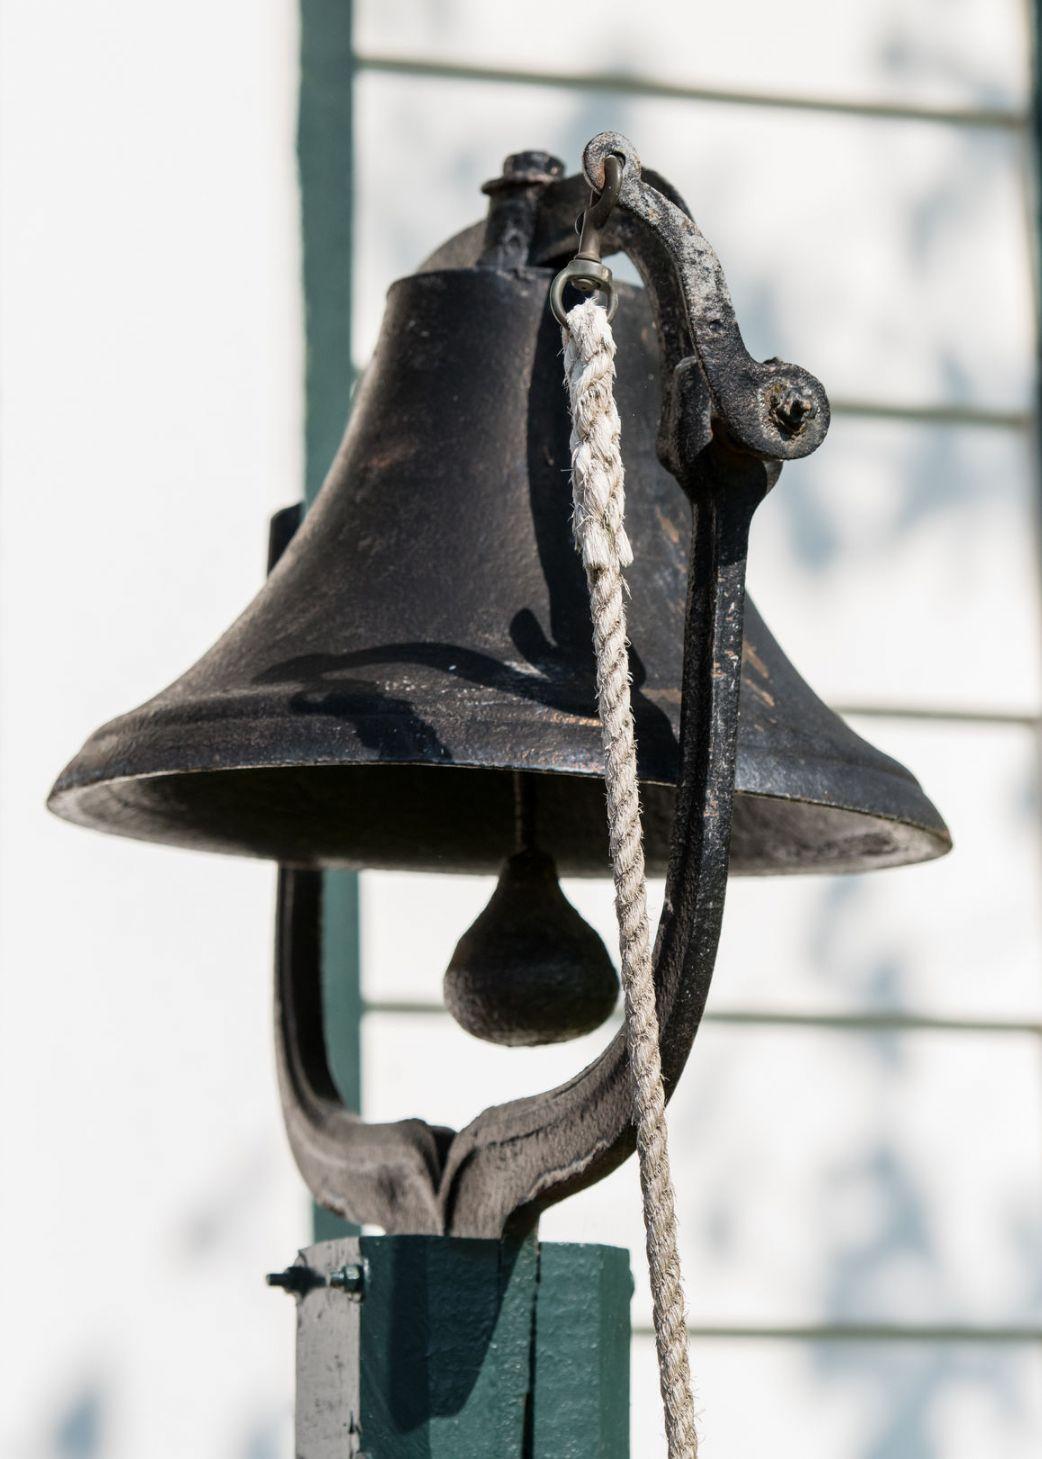 Picture of: Types Of Bells To Ring Dinner Bell Bell Ringer App